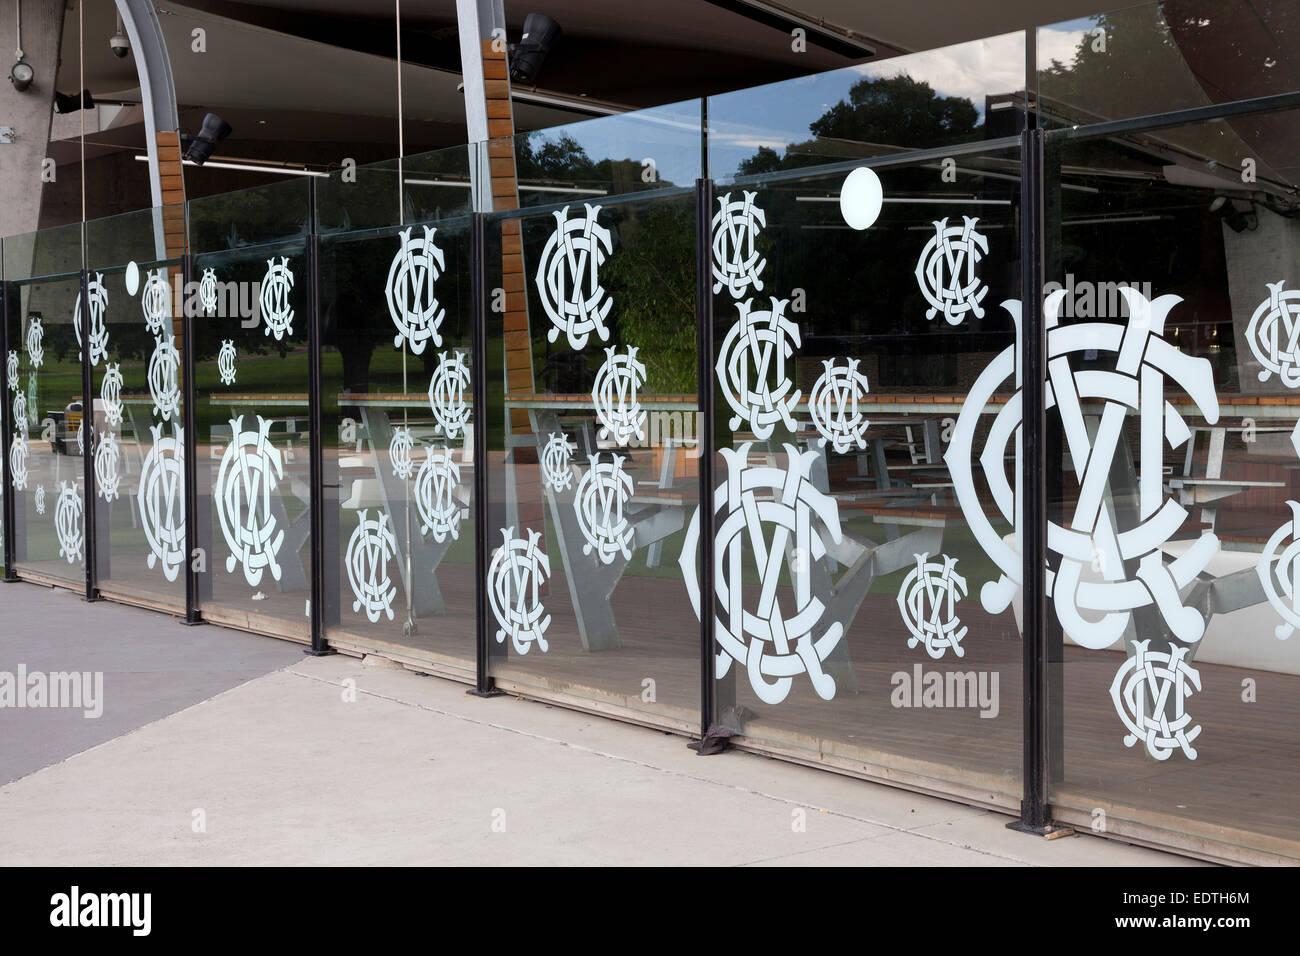 Melbourne cricket ground logo on the windows, Australia - Stock Image